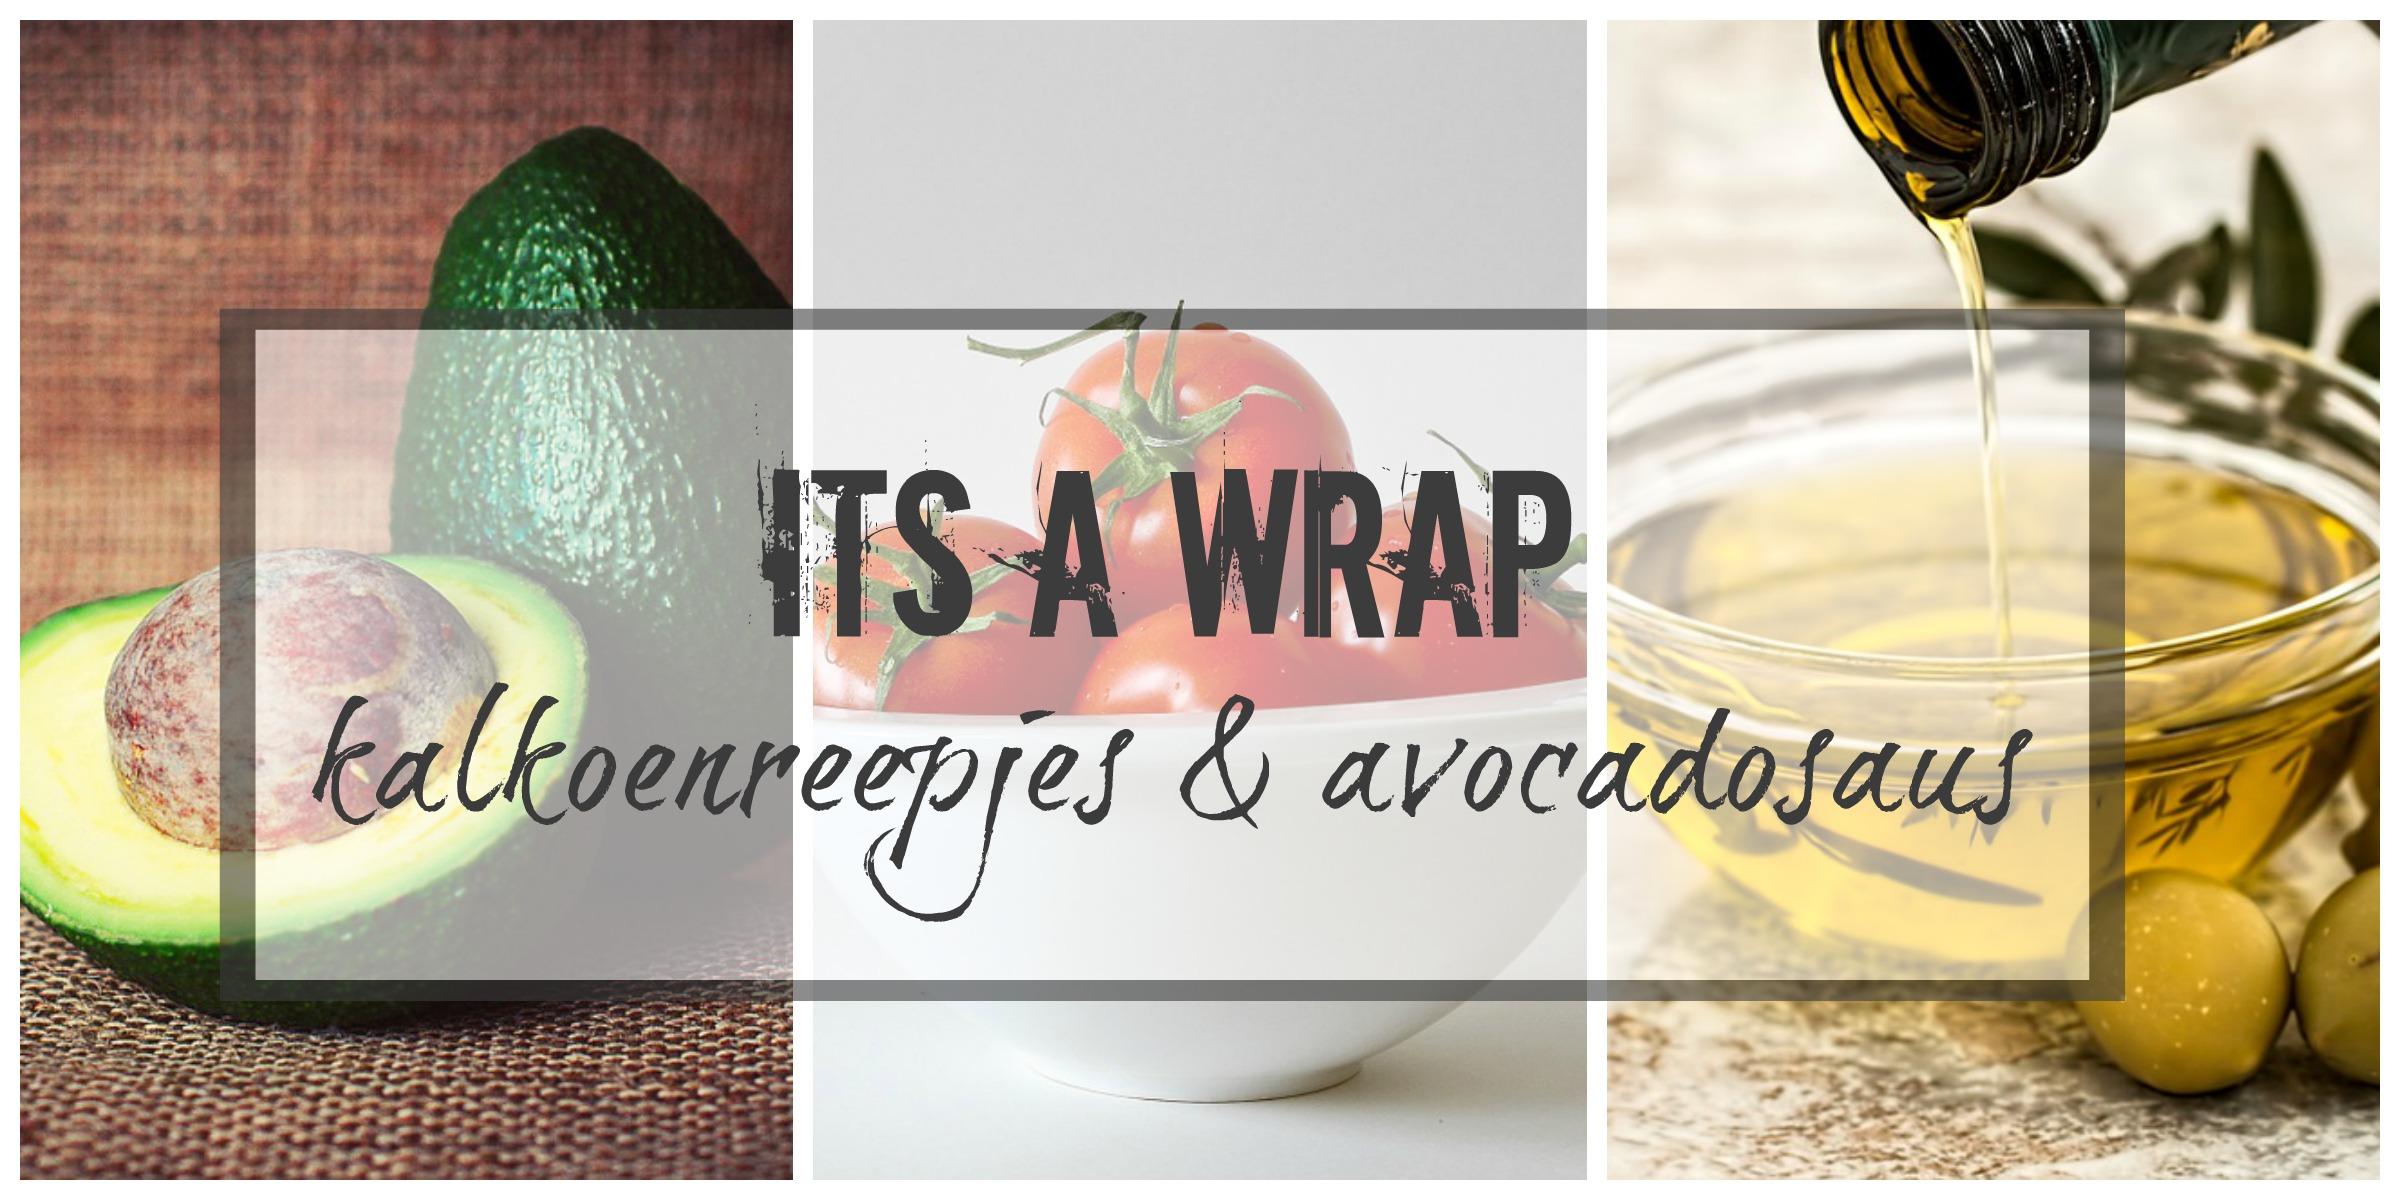 Wraps met kalkoenreepjes en avocadosaus